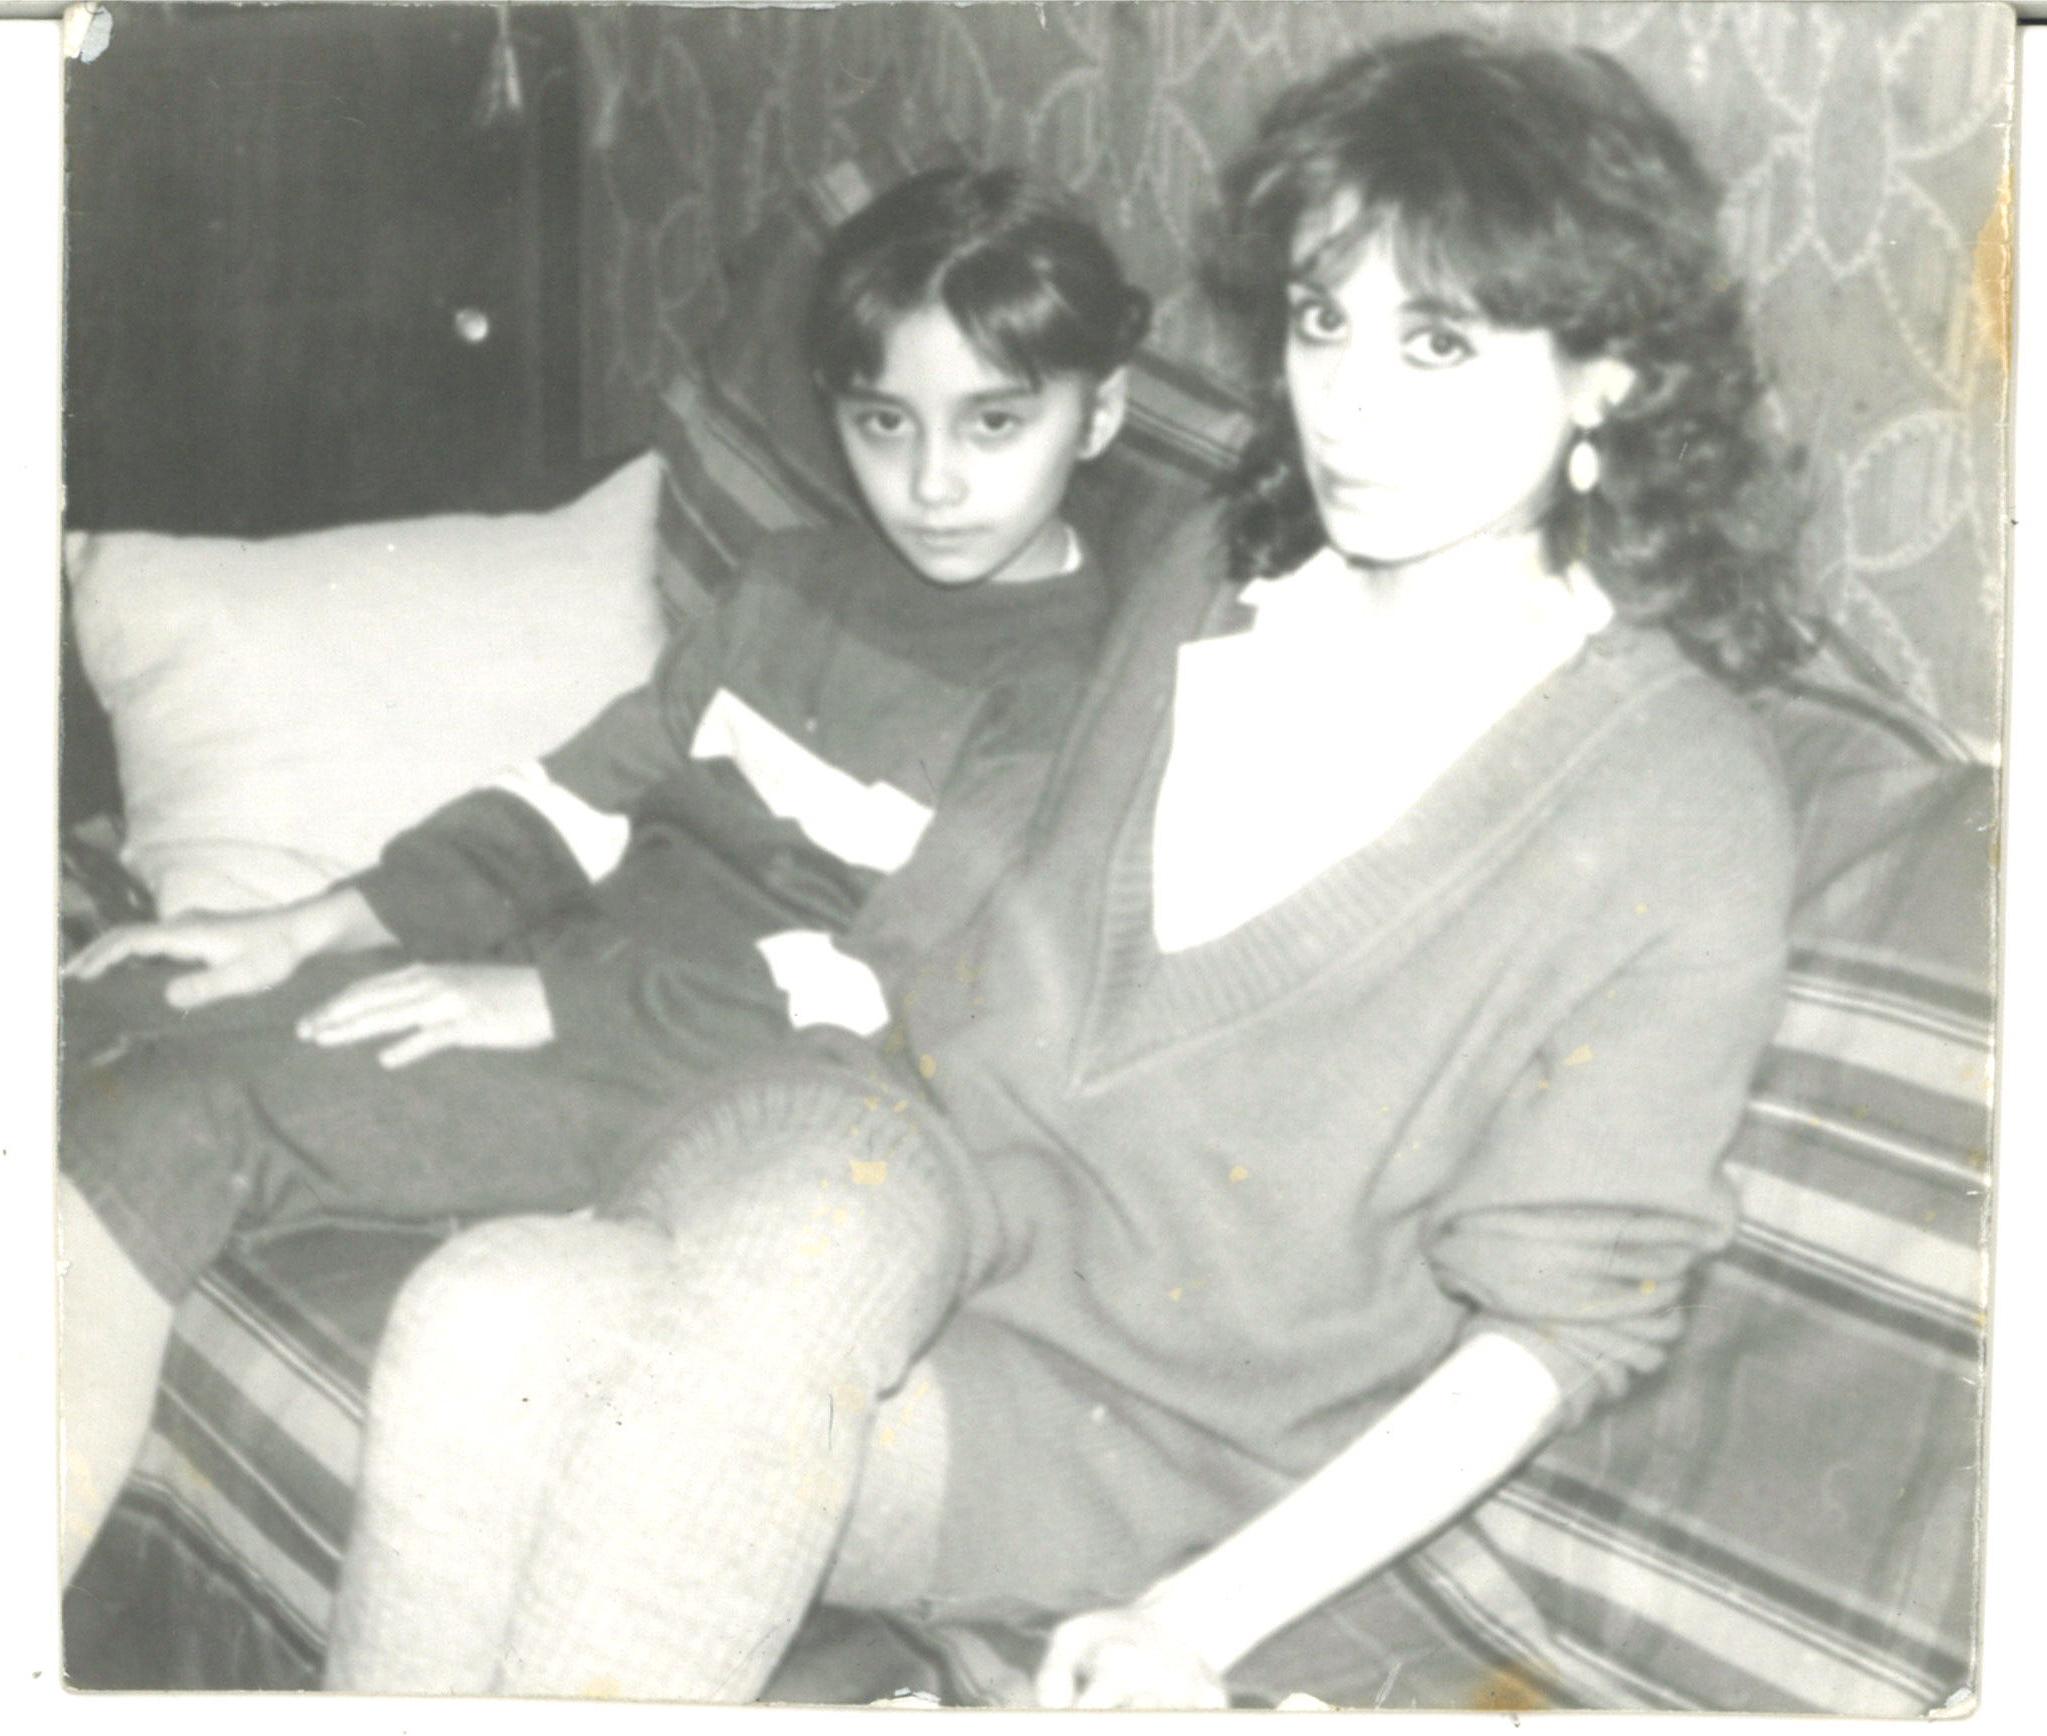 With Luda - Leningrad, 1988